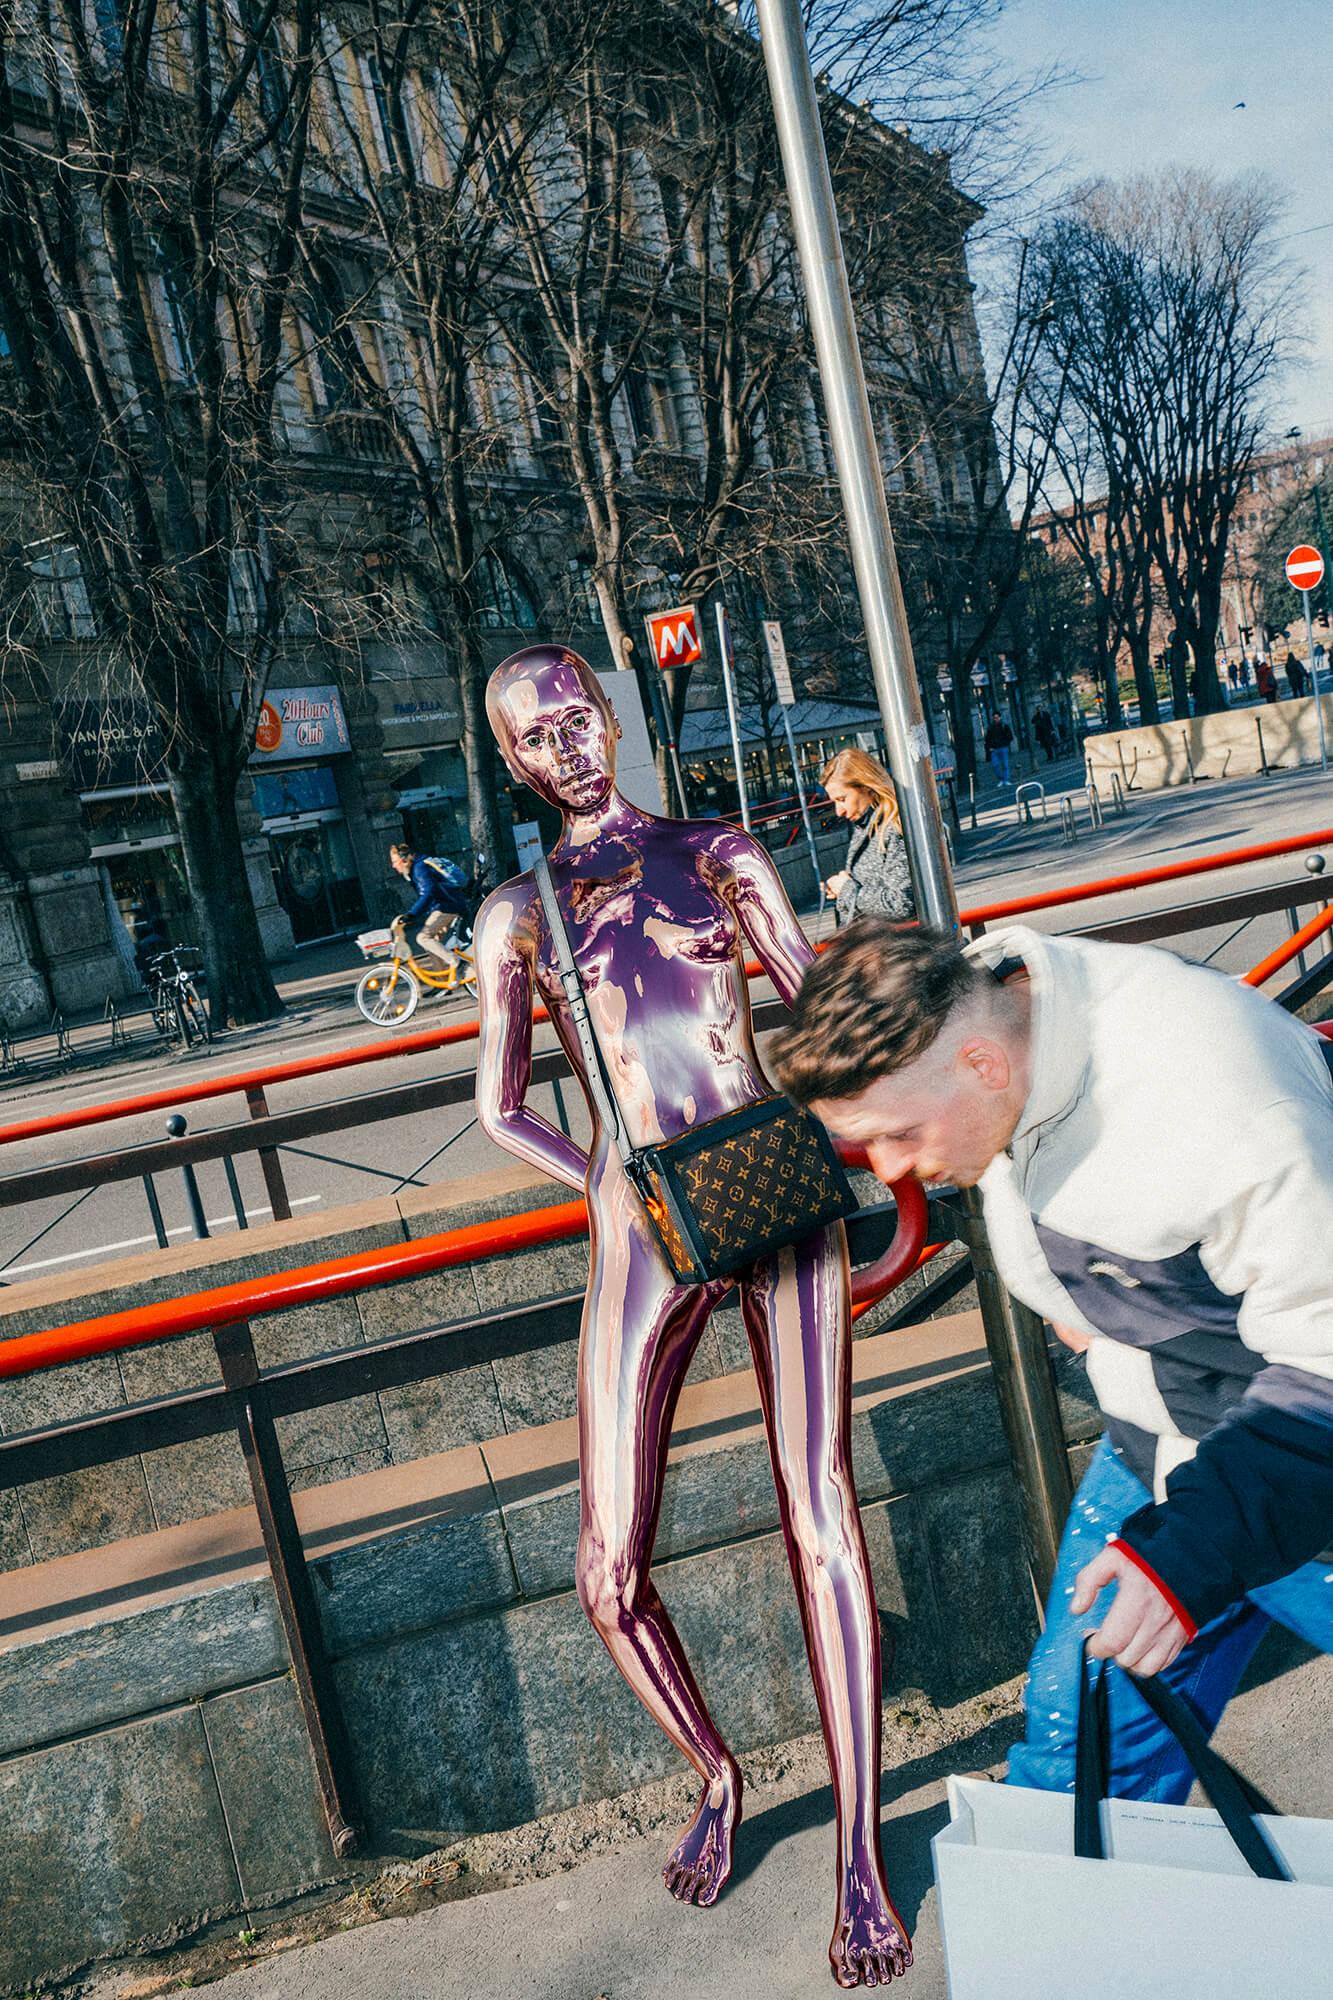 Louis Vuitton lleva humanoides de cromo a Milán en su nueva e impactante campaña